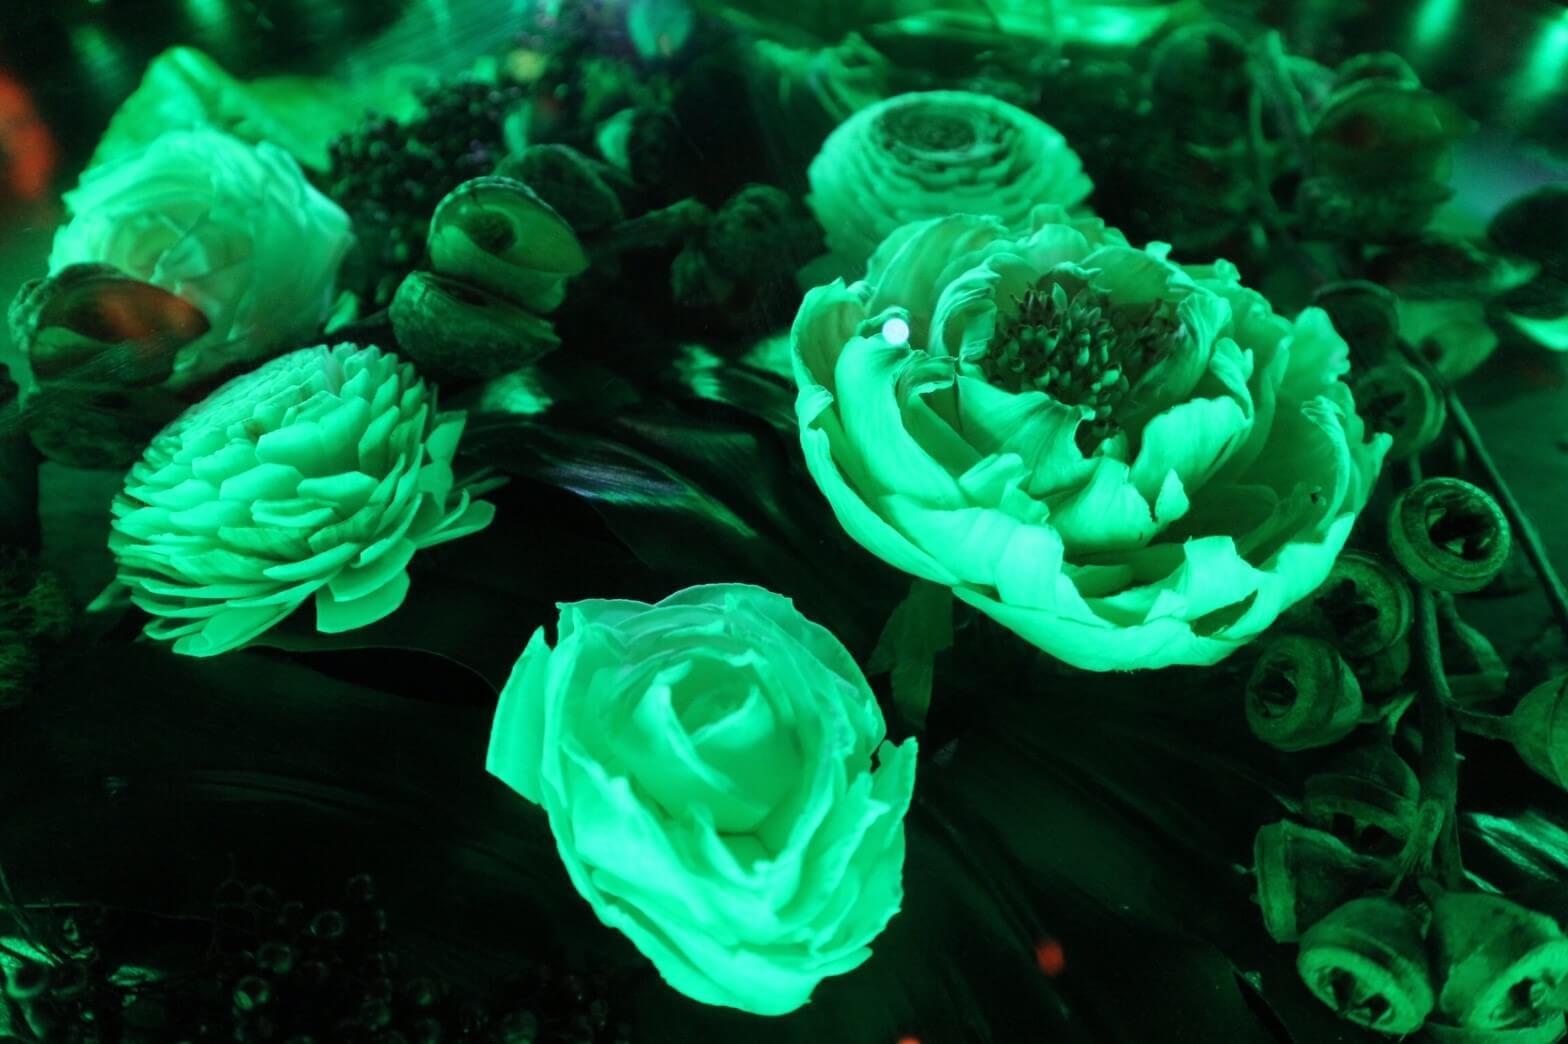 flowers by naked 六本木_8698